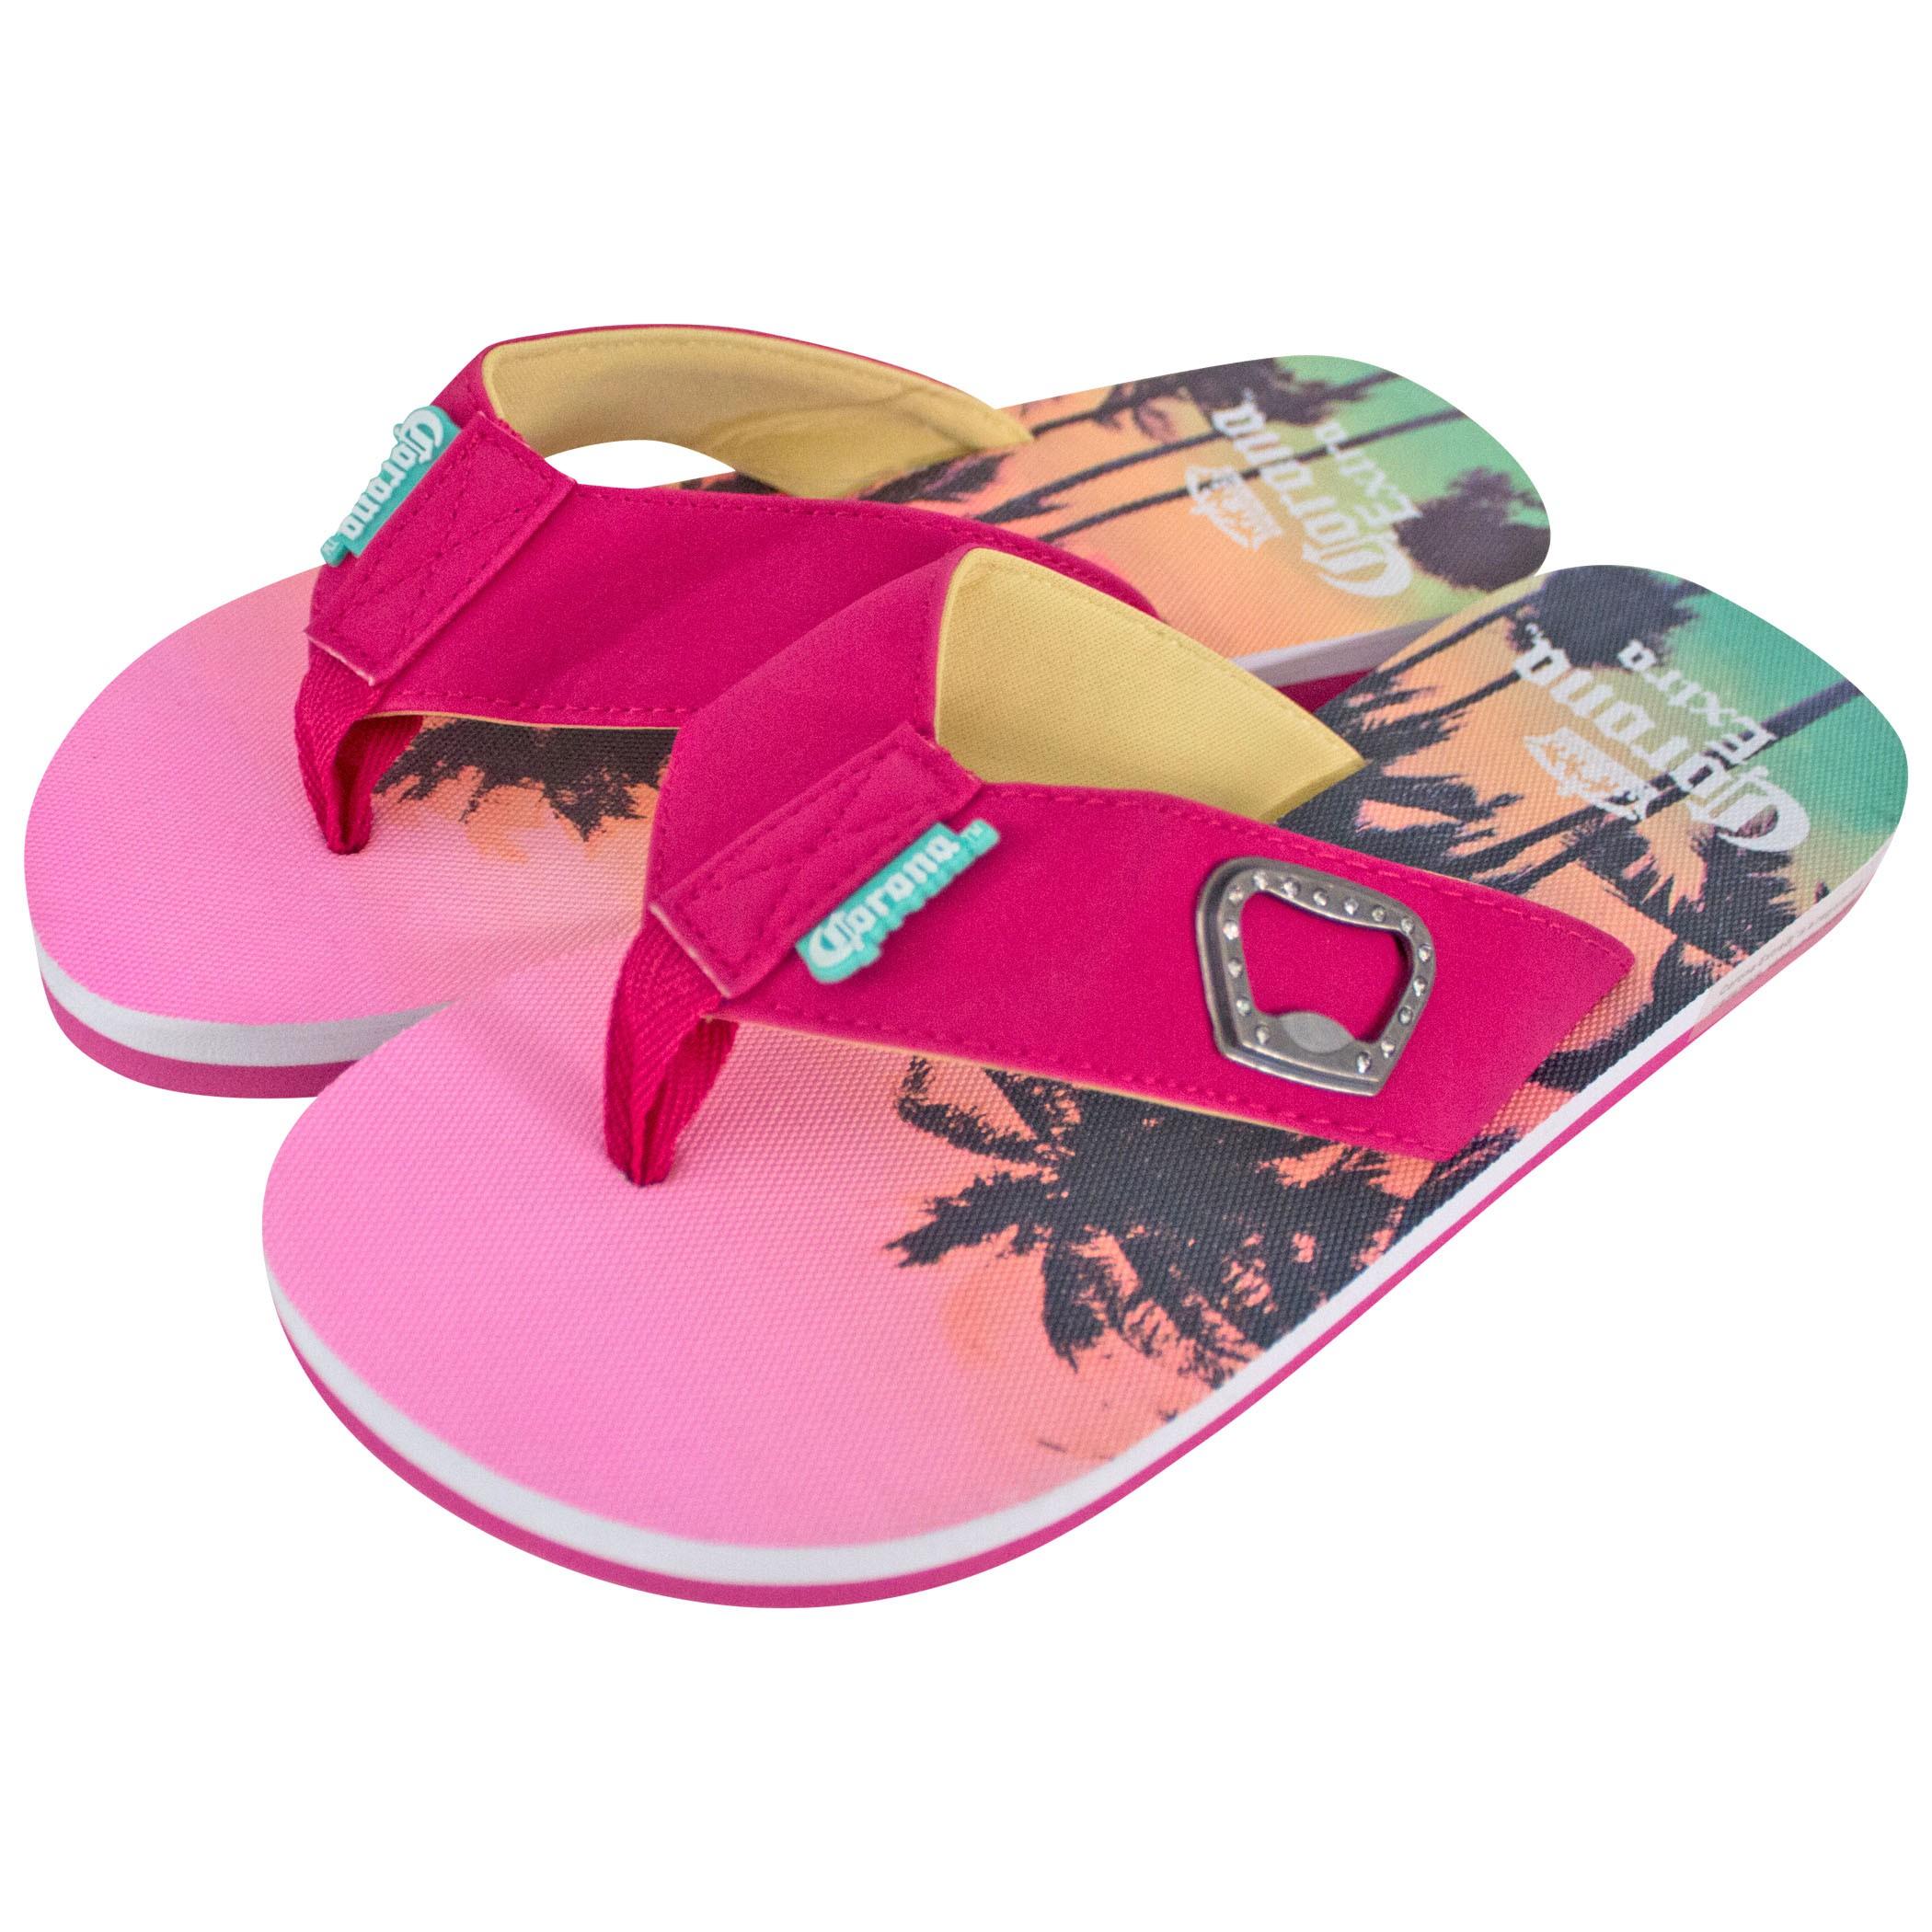 Corona Extra Pink Sunset Women's Sandals